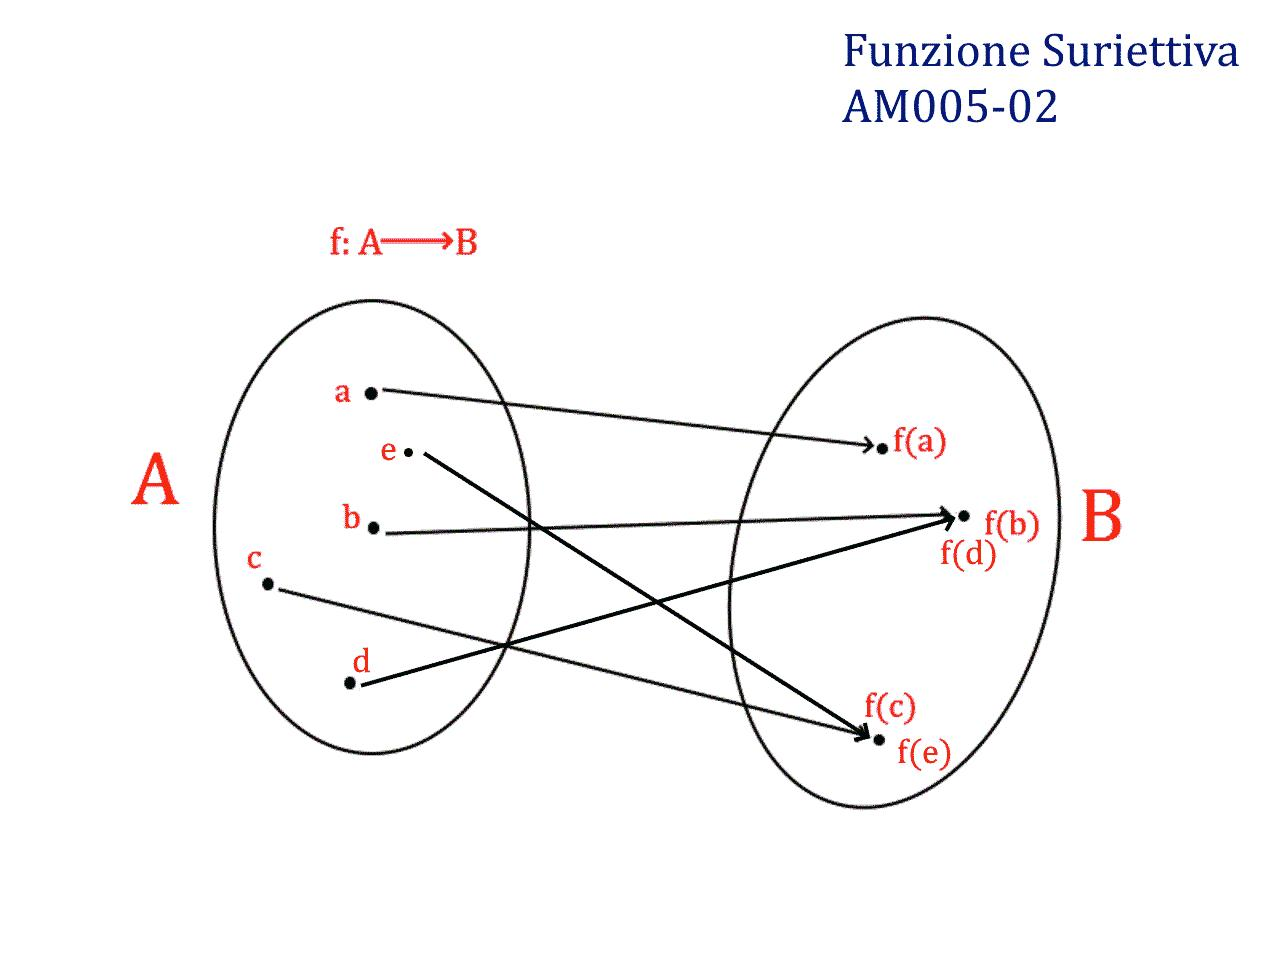 Analisi Matematica - Paniere Ecampus - Funzione Suriettiva - AM005-02